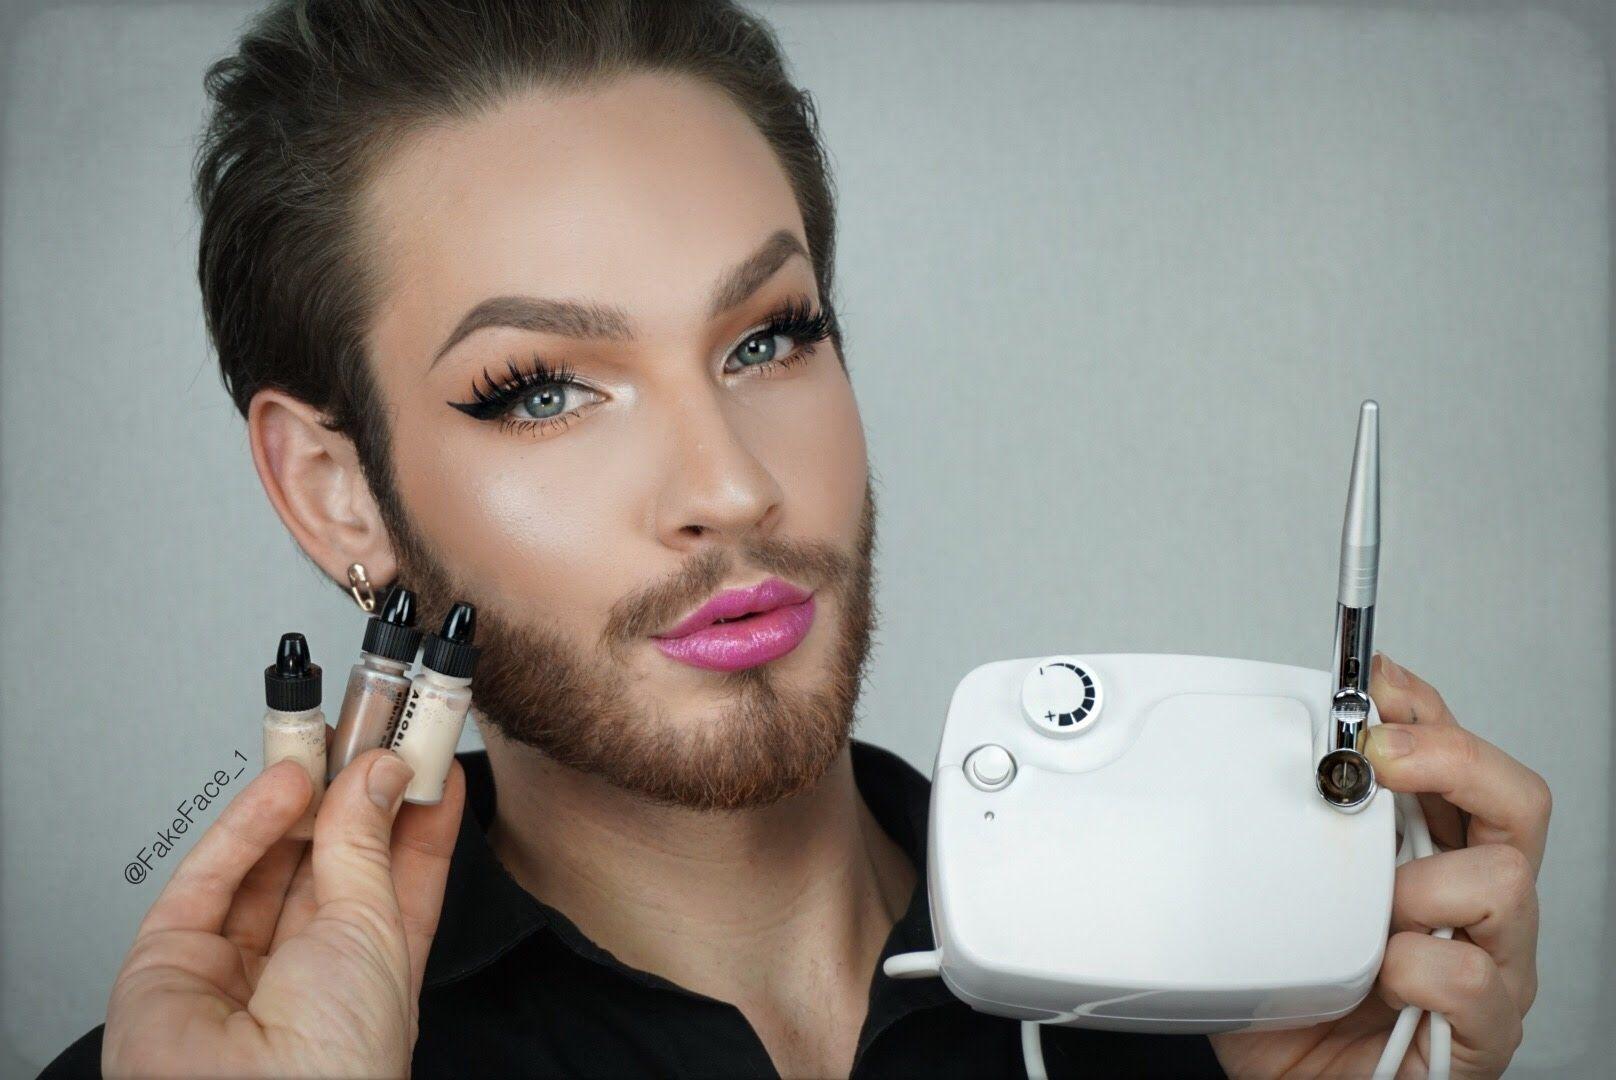 How to get Airbrushed Makeup FakeFace Airbrush makeup